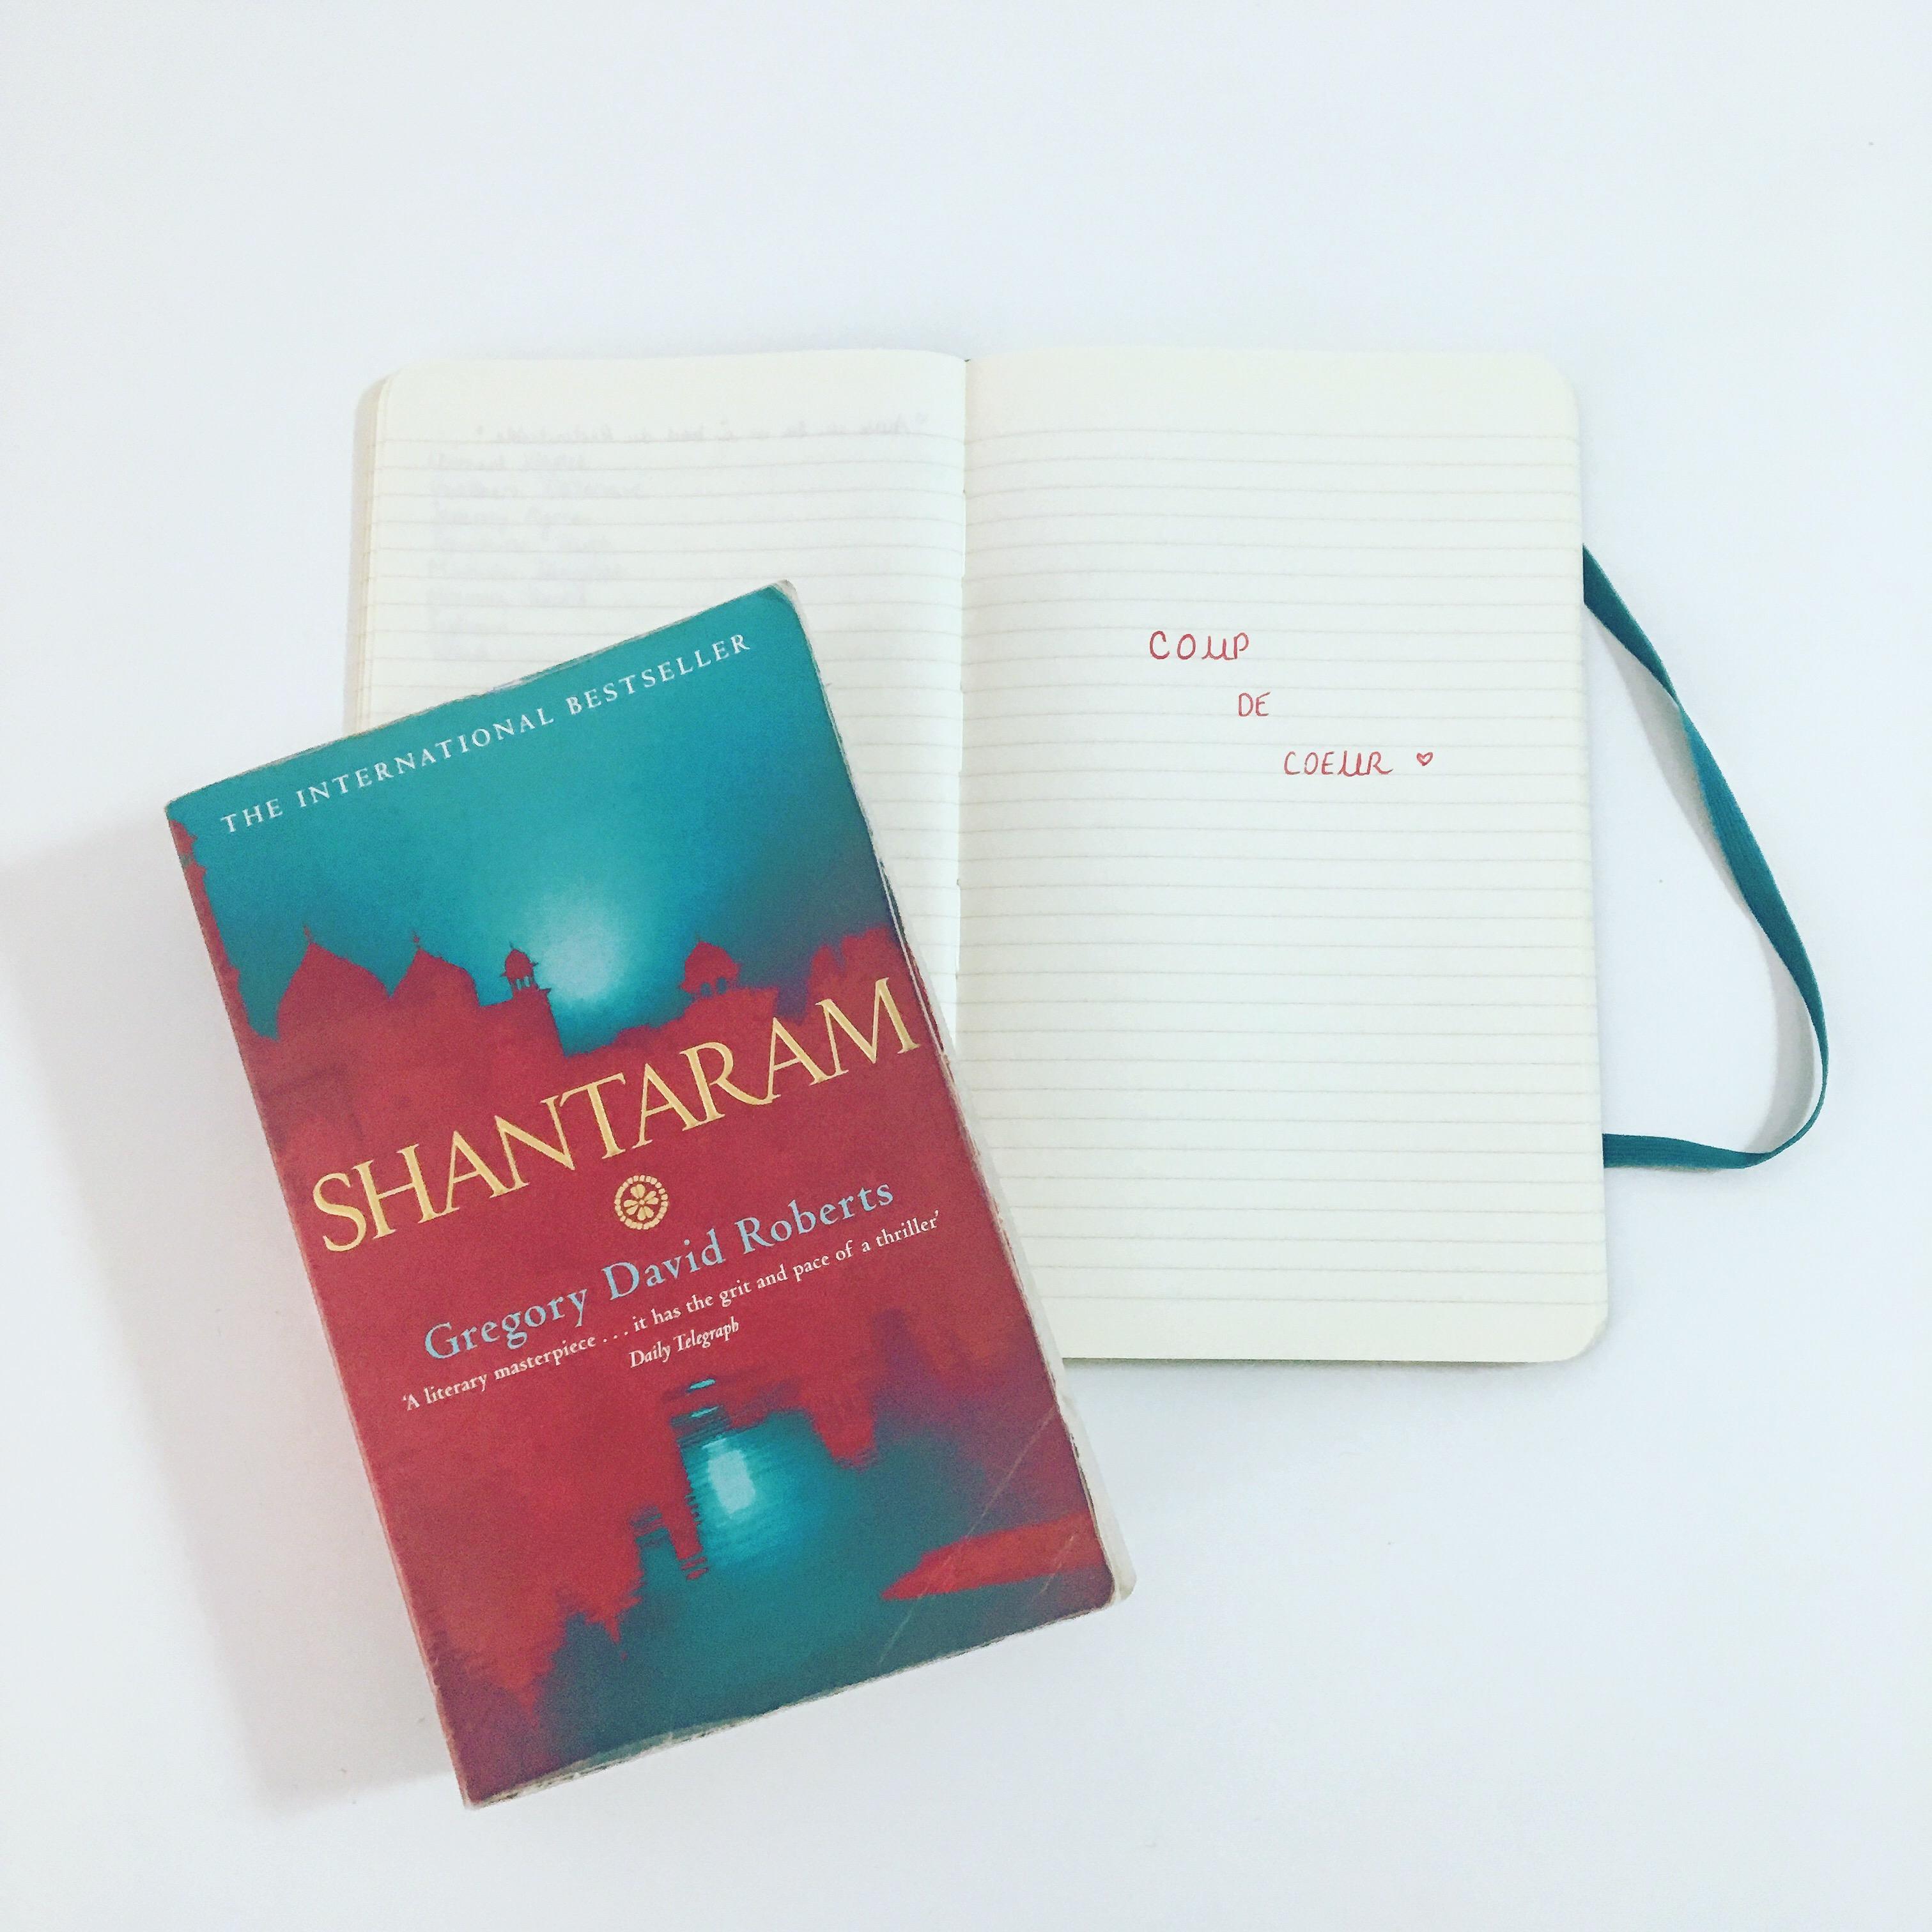 shantaram - gregory david roberts - the unamed bookshelf